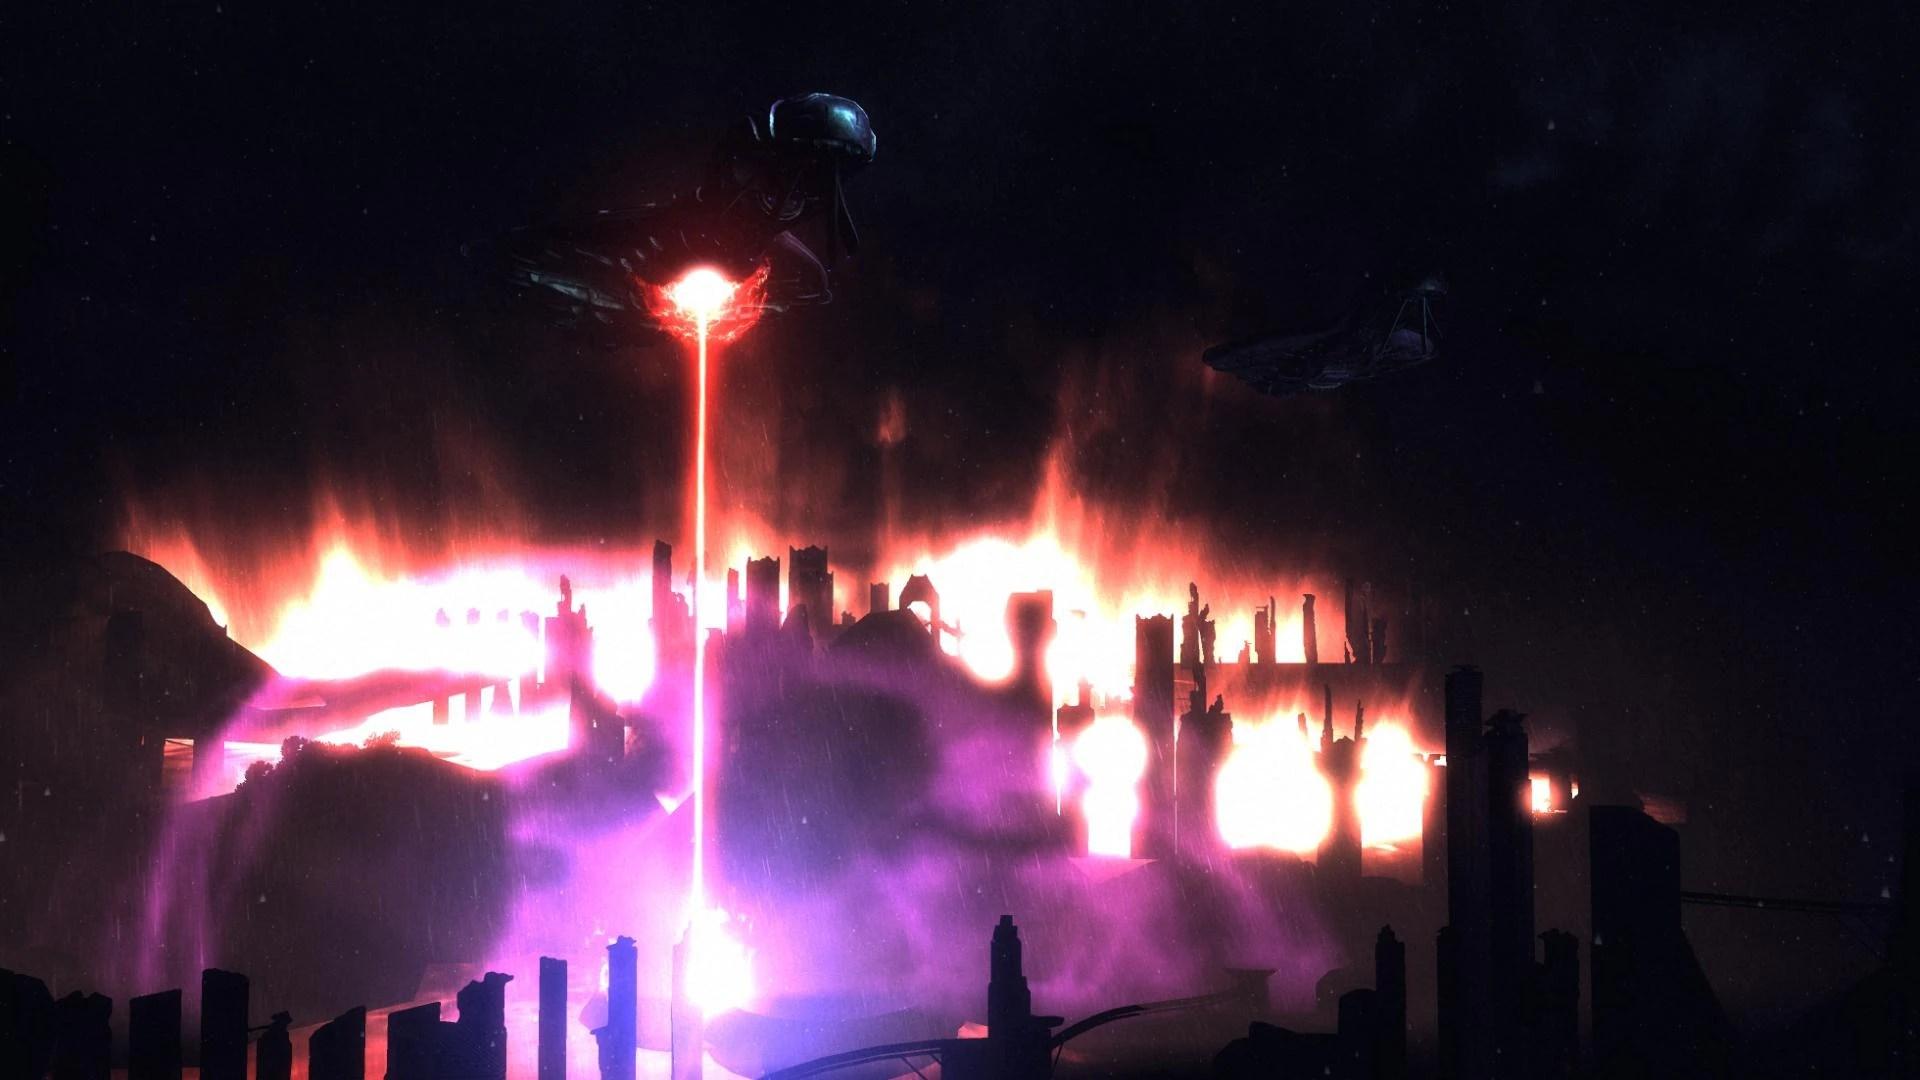 Halo Wallpaper Fall Of Reach Raid On New Alexandria Halo Nation Fandom Powered By Wikia